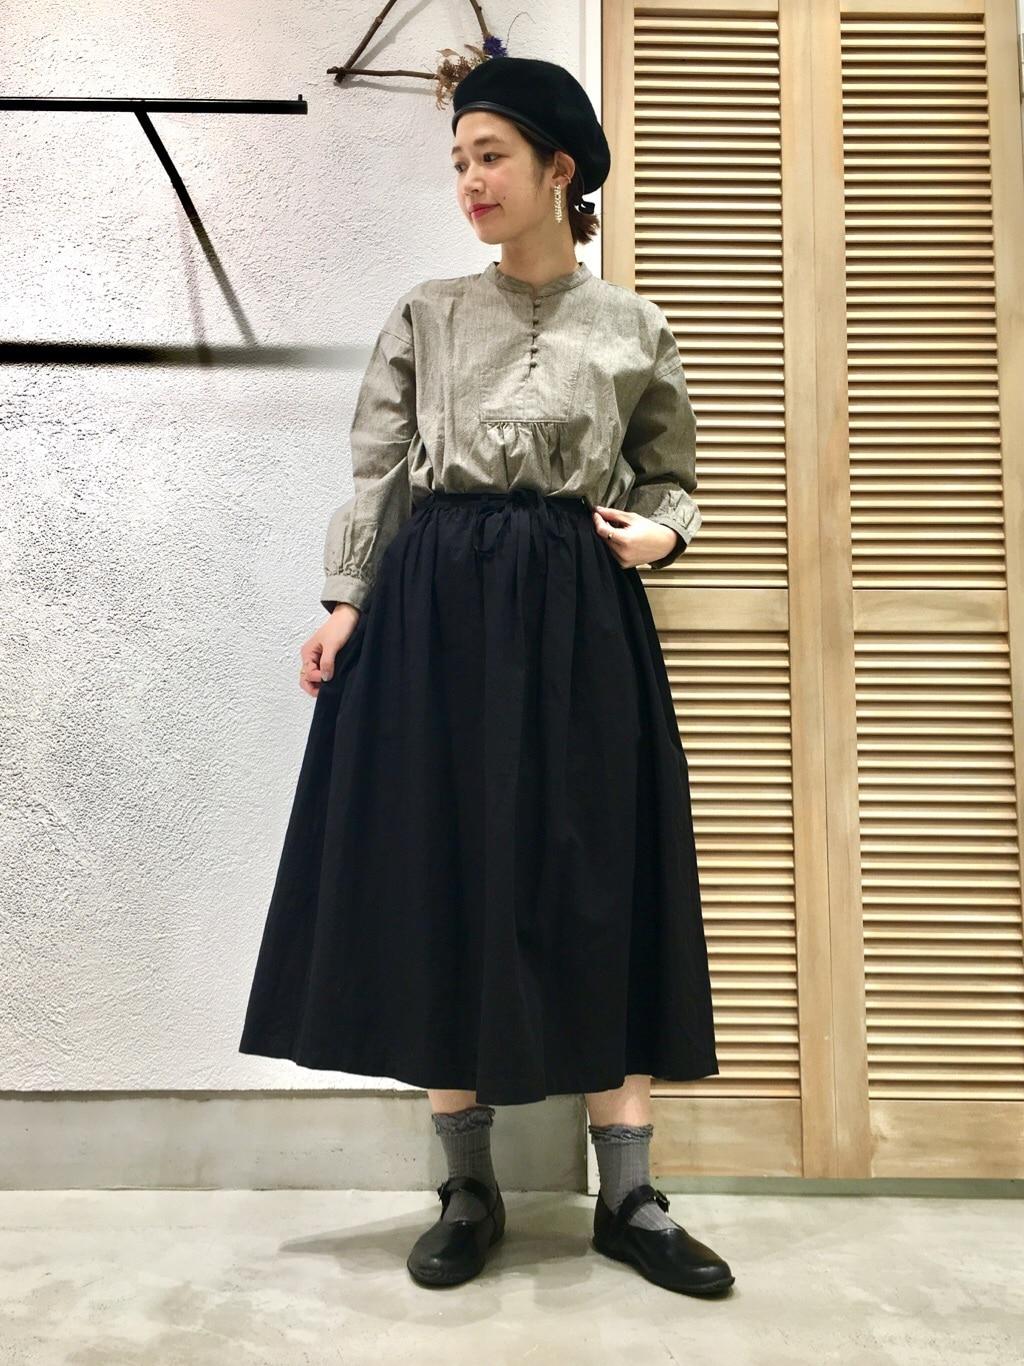 chambre de charme 横浜ジョイナス 身長:160cm 2021.01.30